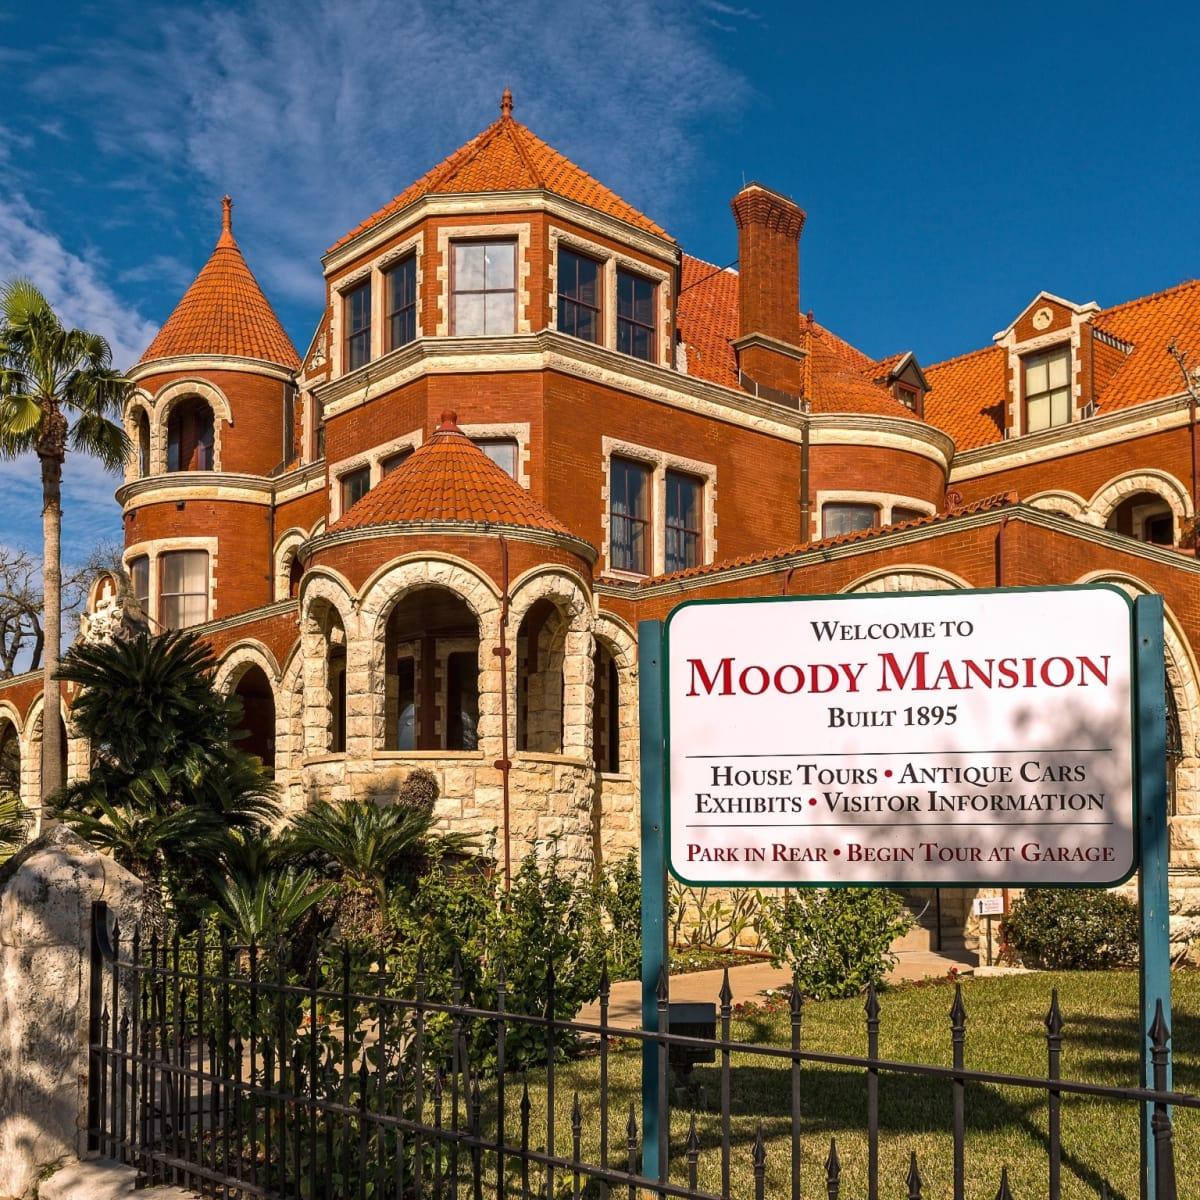 Moody Mansion in Galveston